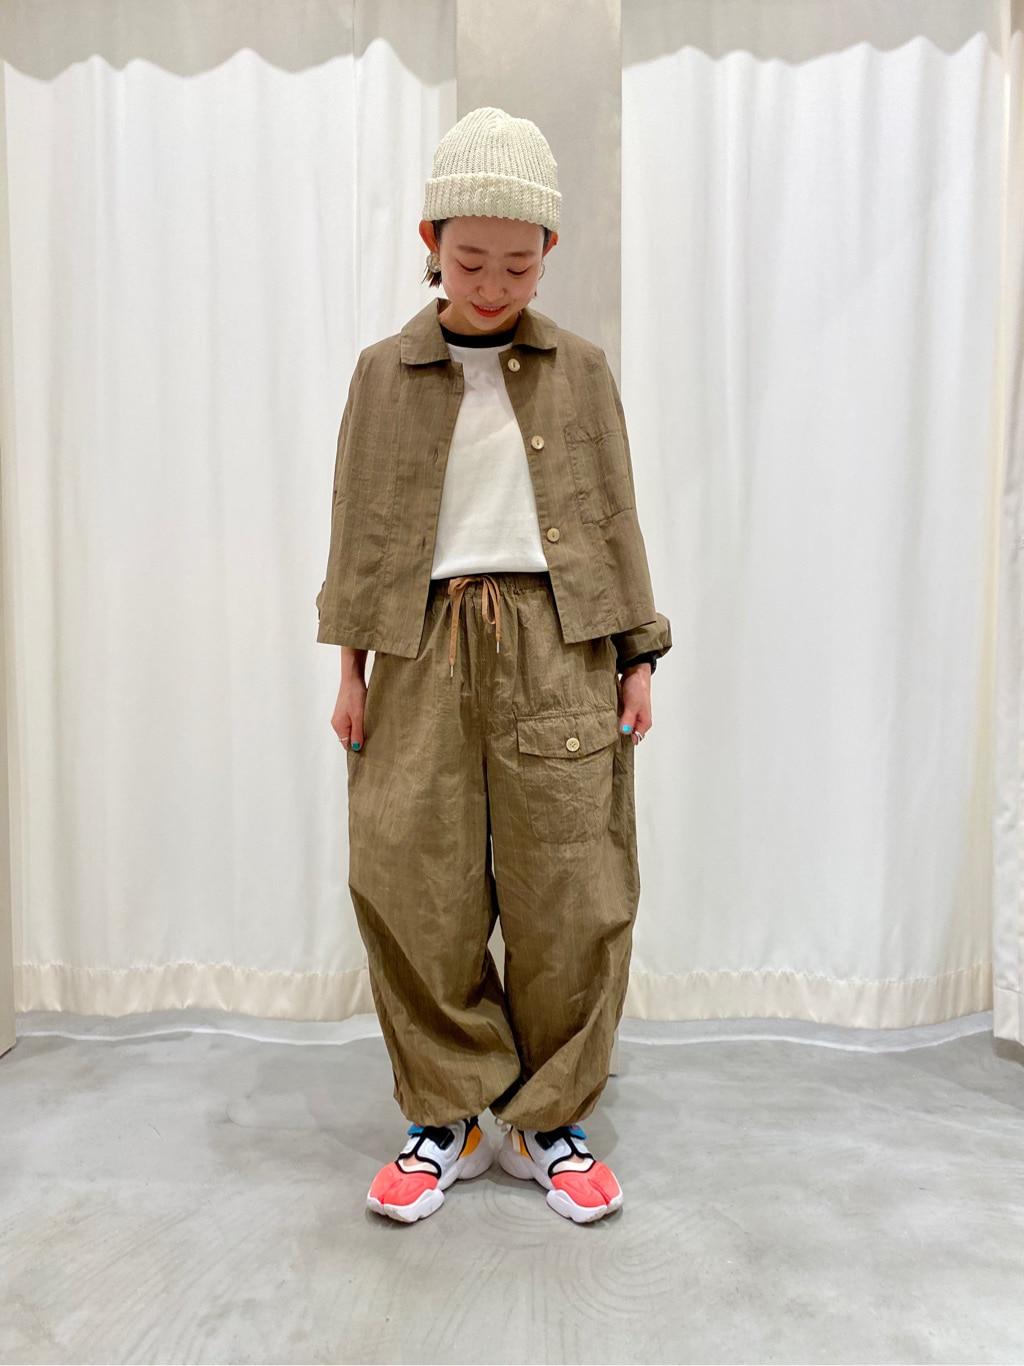 AMB SHOP CHILD WOMAN CHILD WOMAN , PAR ICI 東京スカイツリータウン・ソラマチ 身長:150cm 2020.07.28